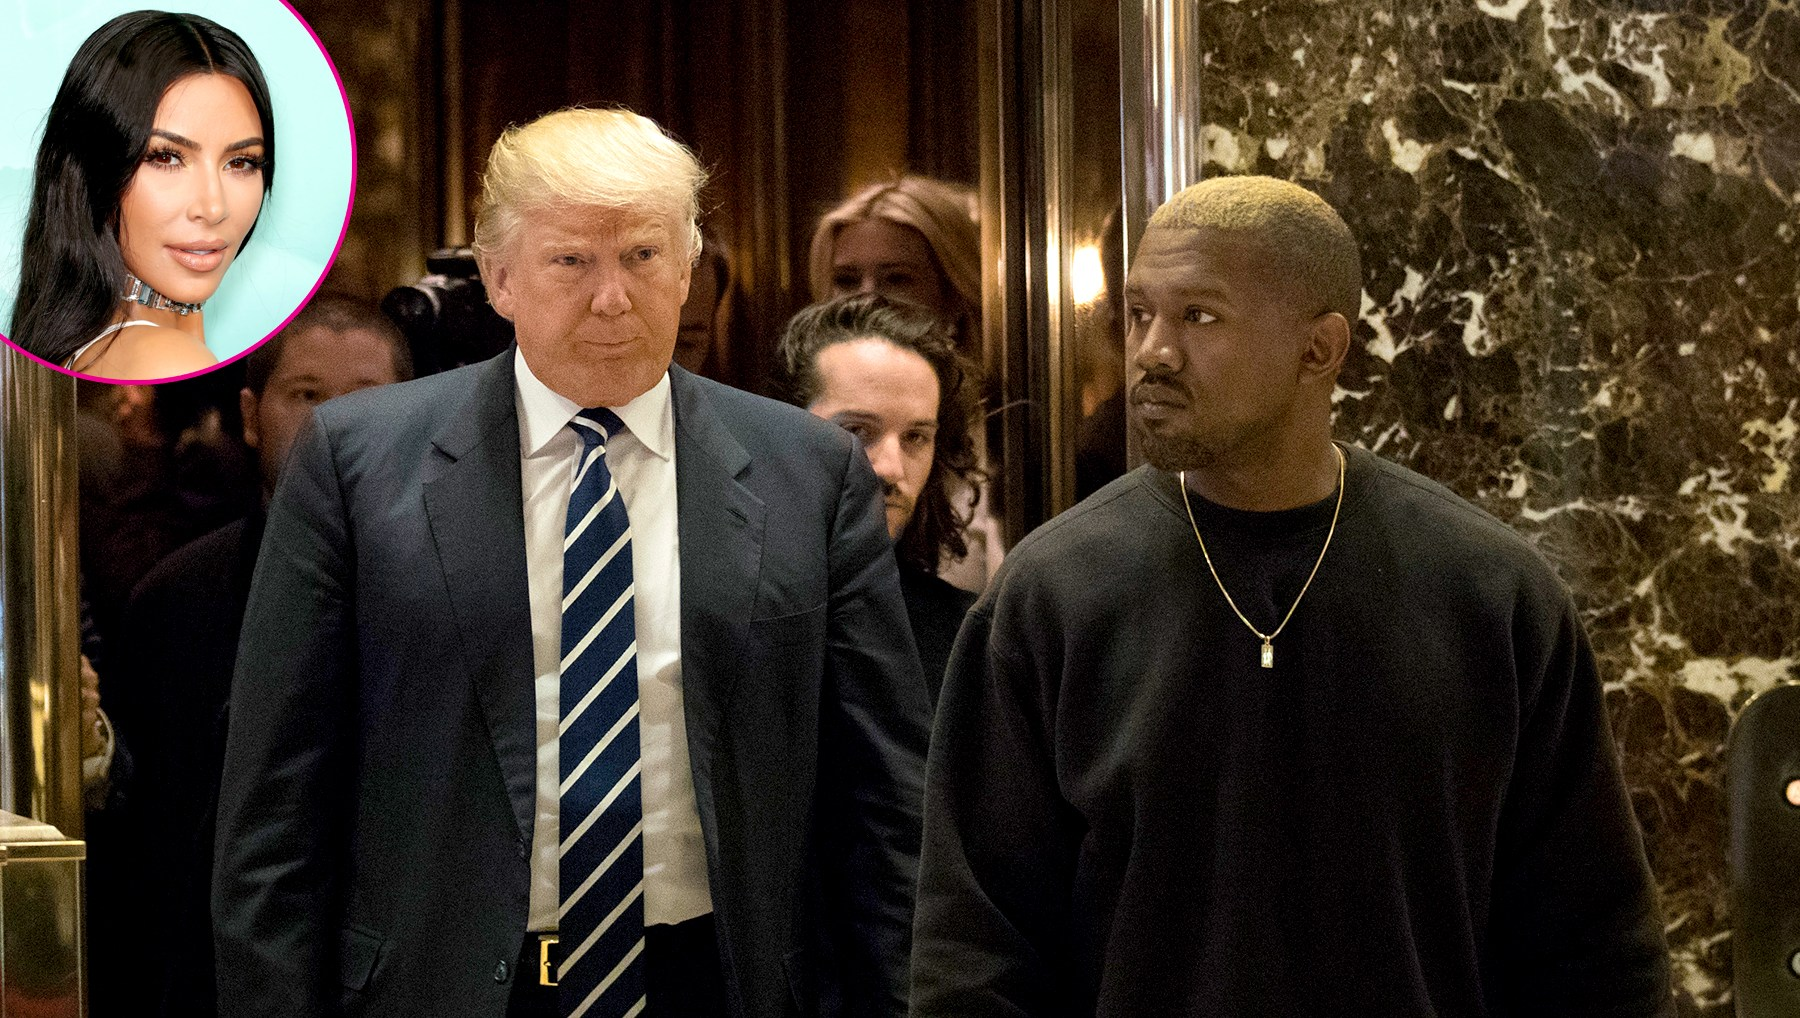 Kim Kardashian Kanye West Donald Trump meeting